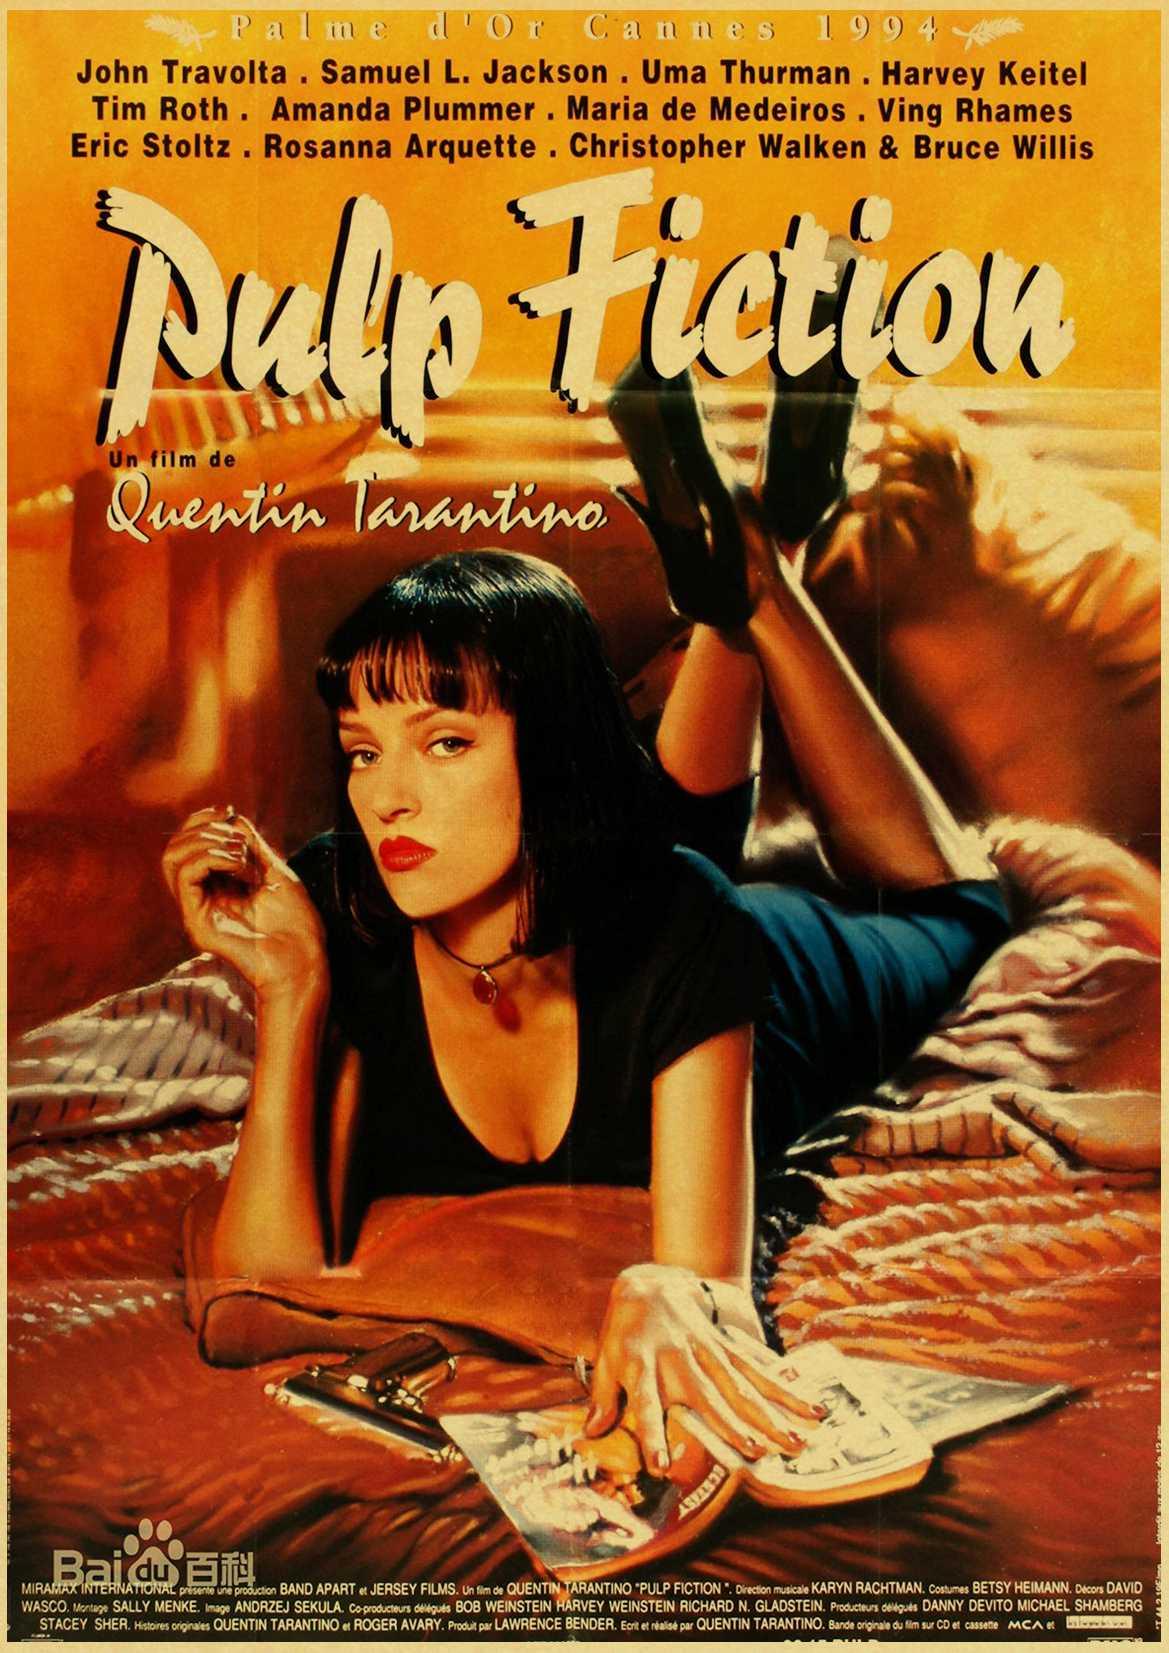 Vintage Poster classic movie Pulp Fiction / Kill Bill/Fight Club poster Retro kraft paper posters decorative art painting